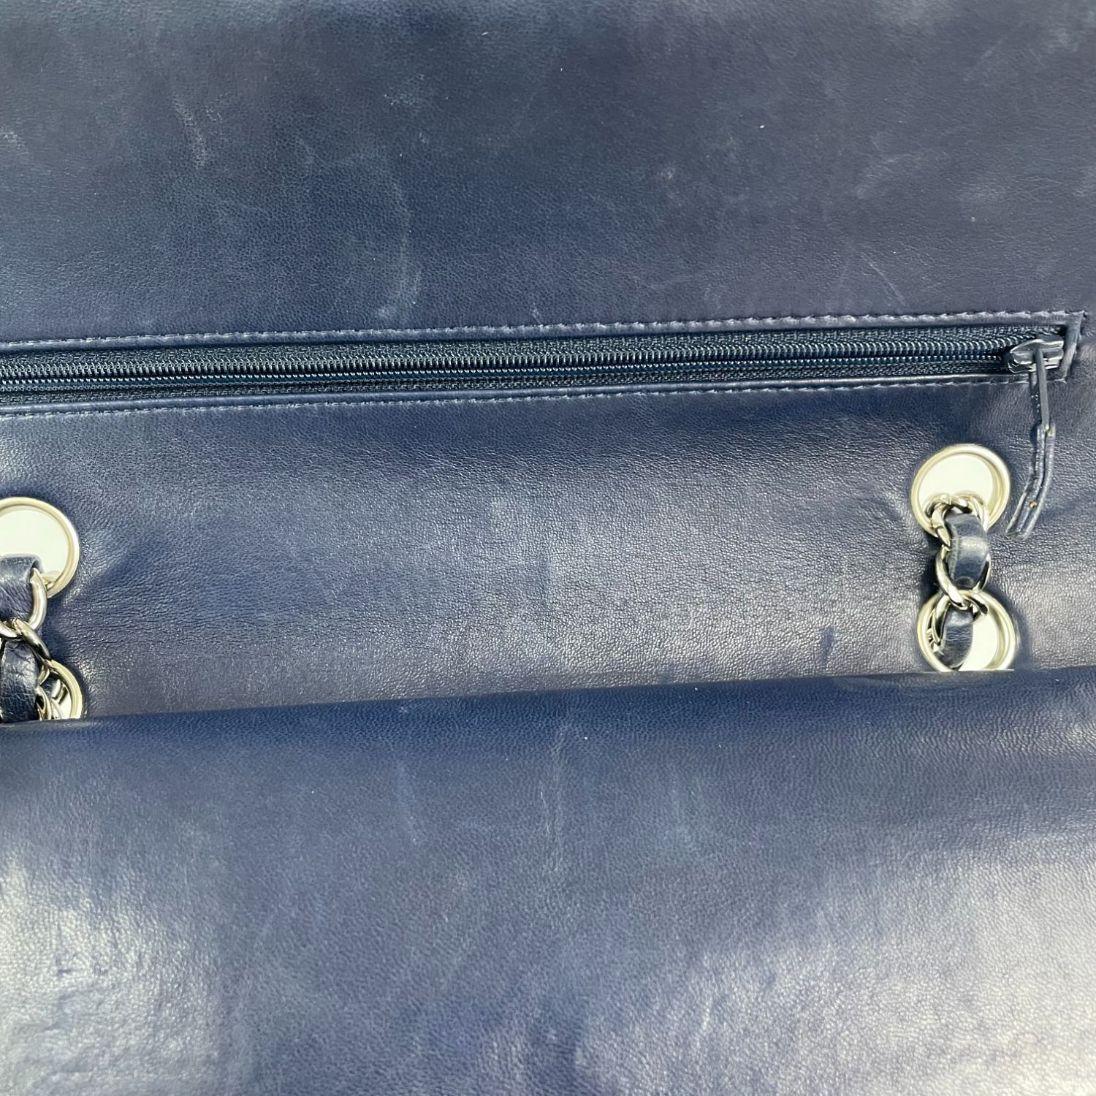 Bolsa Chanel Classic Double Flap